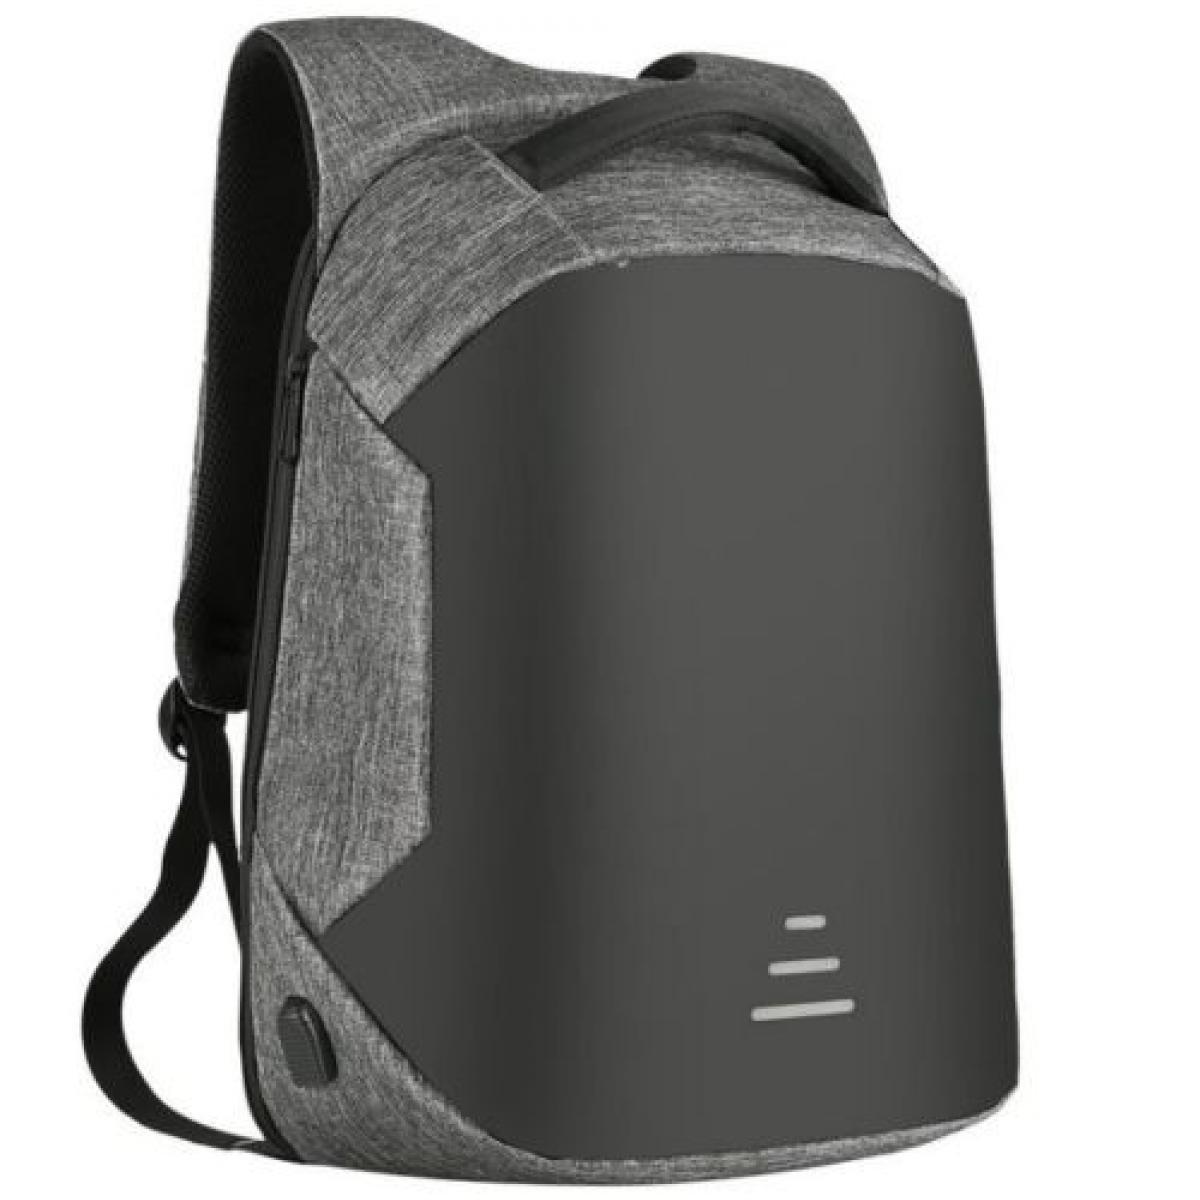 NOTEBOOK BAG OKADE S41 15.6 COLOR صوت+USB ظهر+تطويلة ,Laptop Bag